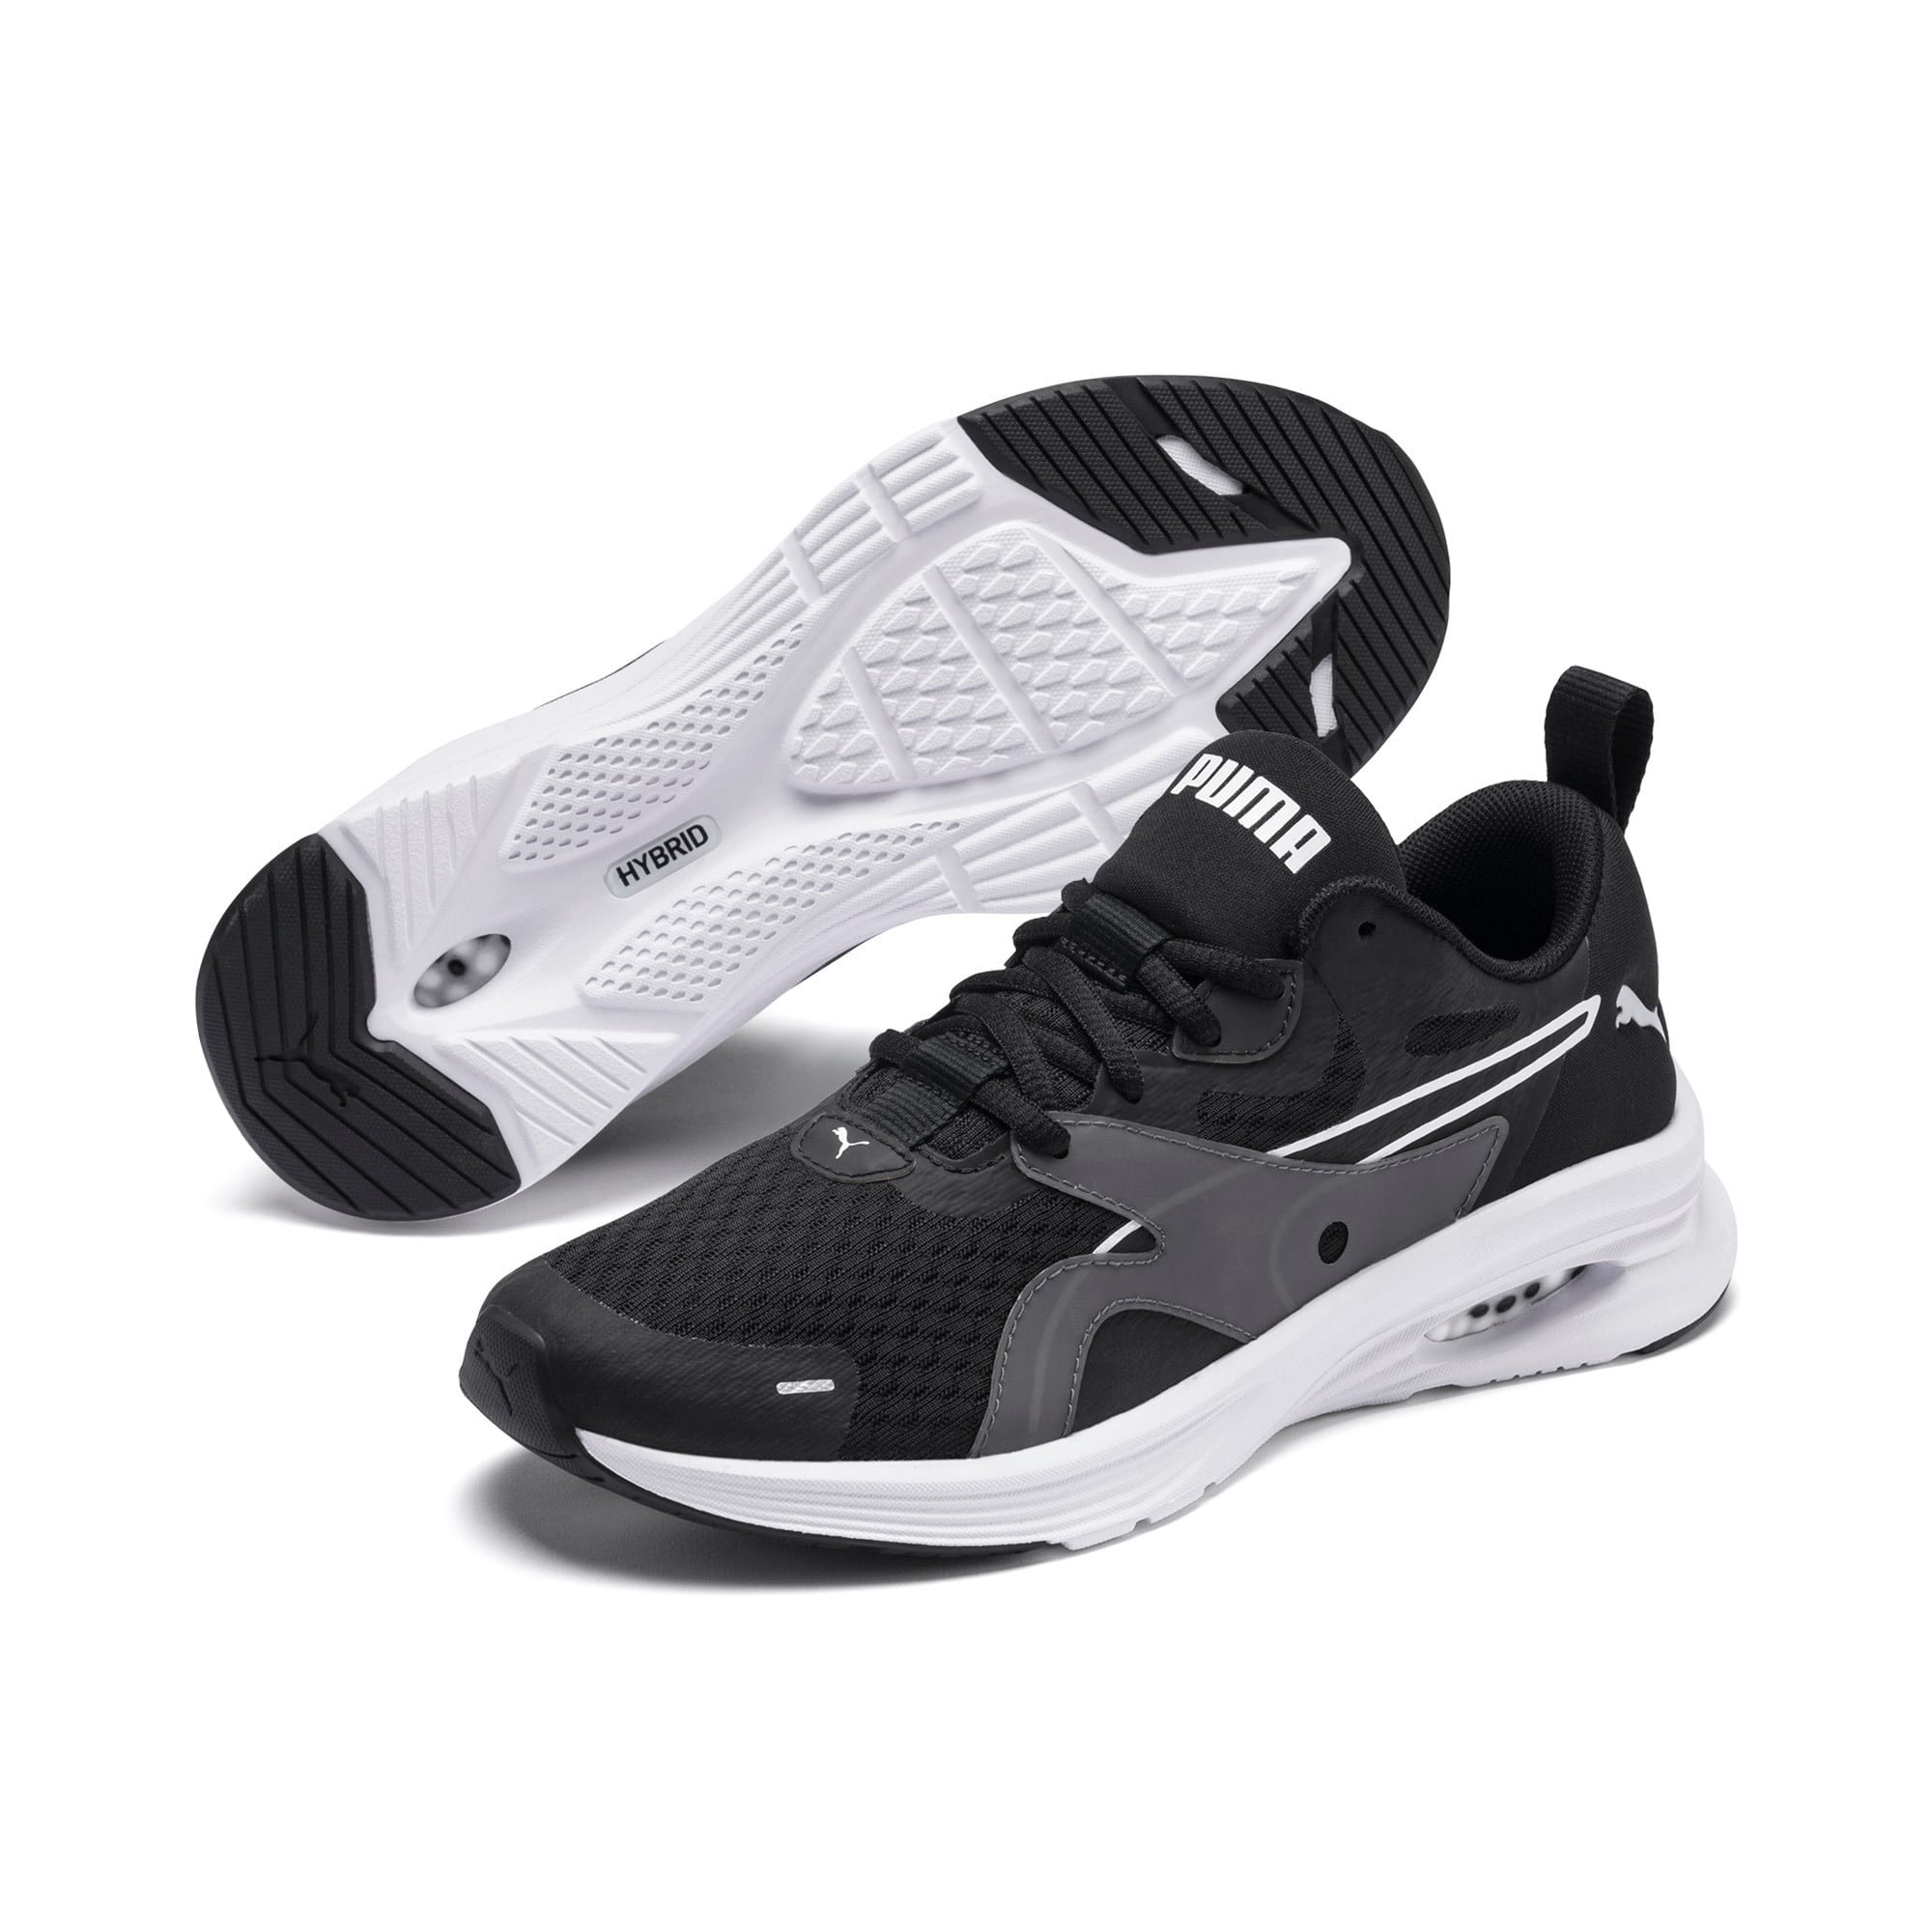 Thumbnail 2 of Damskie buty do biegania HYBRID Fuego, Puma Black-Puma White, medium